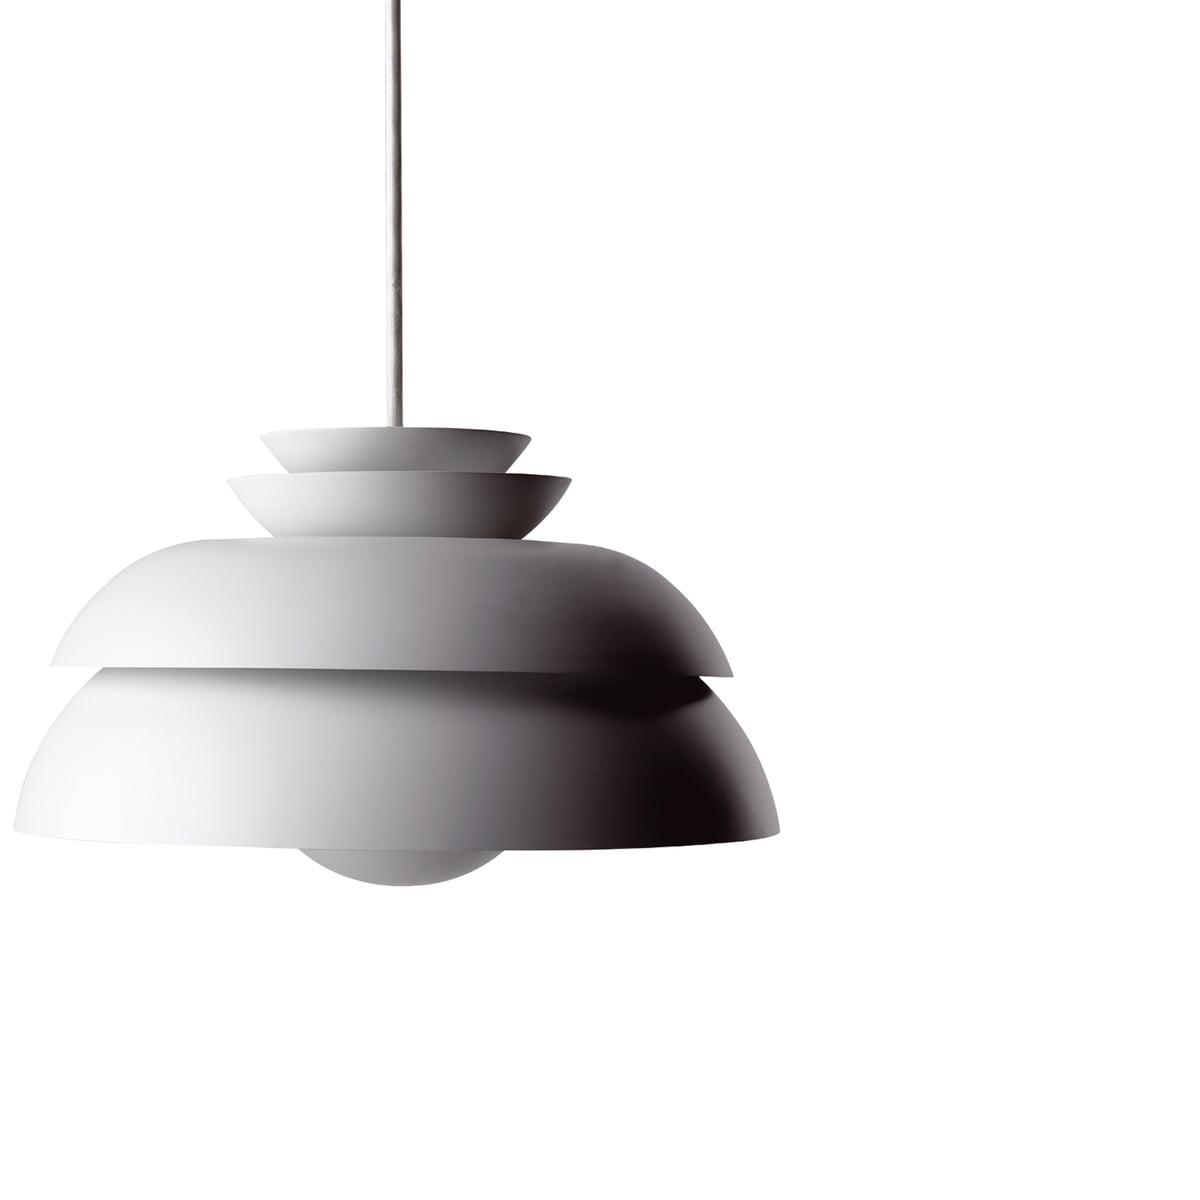 concert p1 suspension lumineuse lightyears boutique. Black Bedroom Furniture Sets. Home Design Ideas